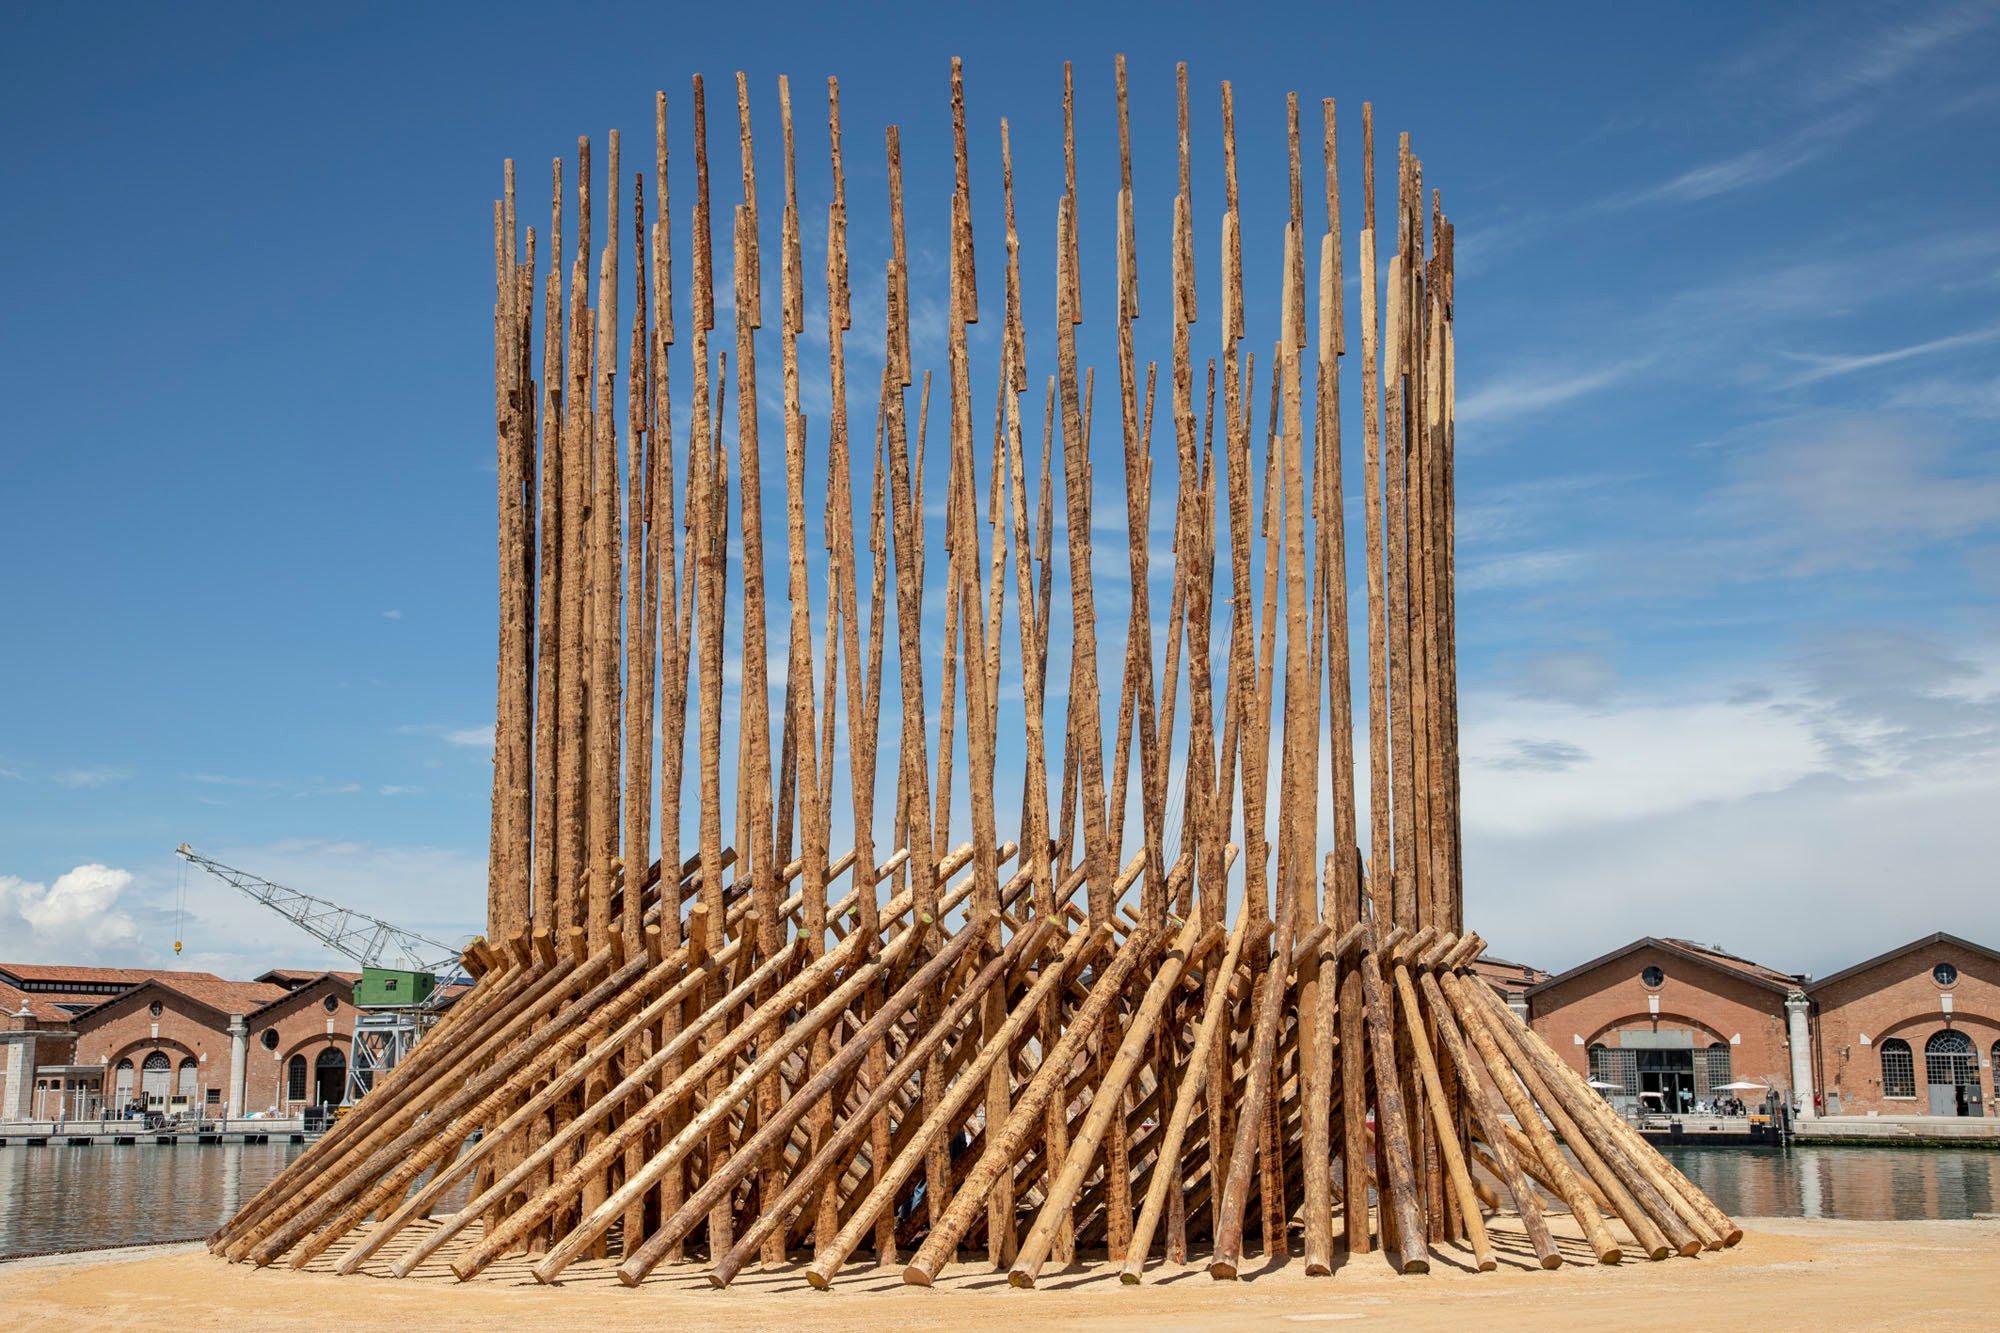 ELEMENTAL /Chileans and Mapuche, Building places to get to know each other (KÜNÜ), Building places to parley (KOYAÜ-WE) / Foto:Marco Zorzanello /Courtesy: La Biennale di Venezia